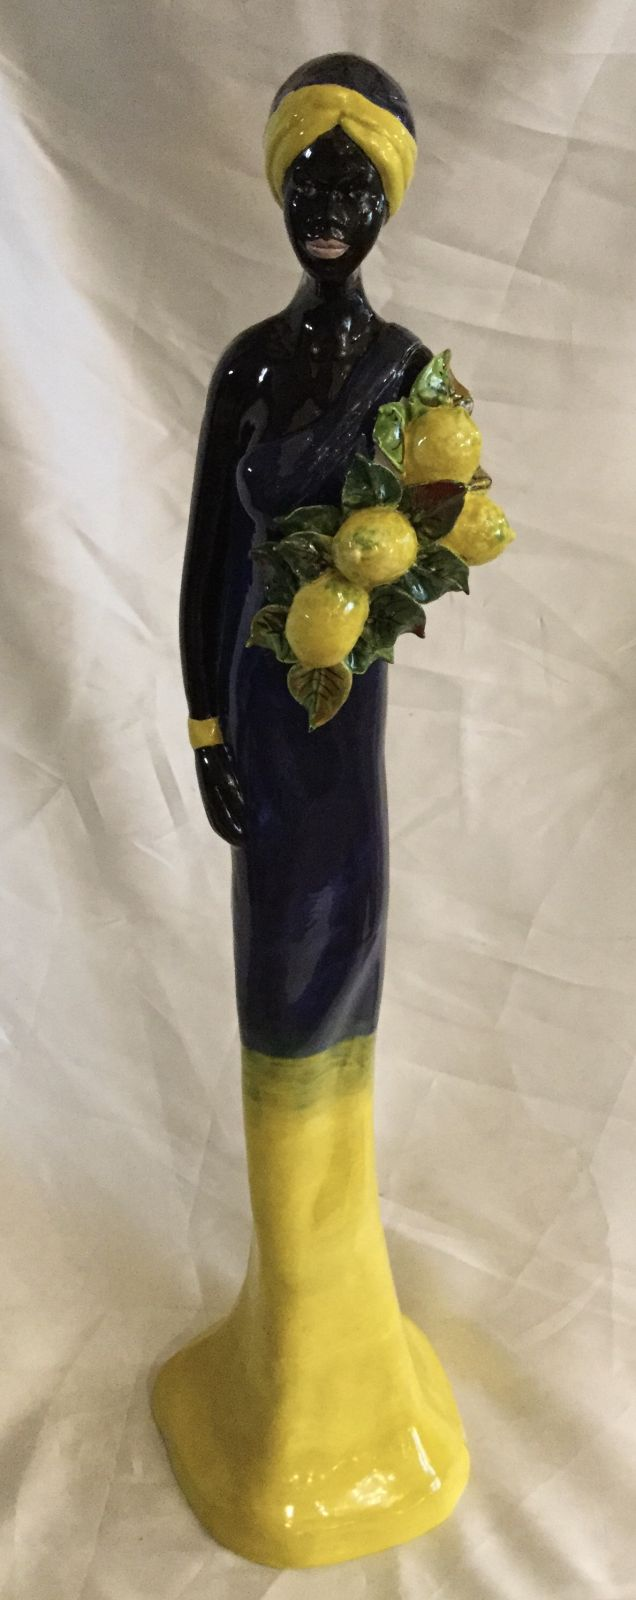 Statua donna africana con limoni  h65 base cm 15